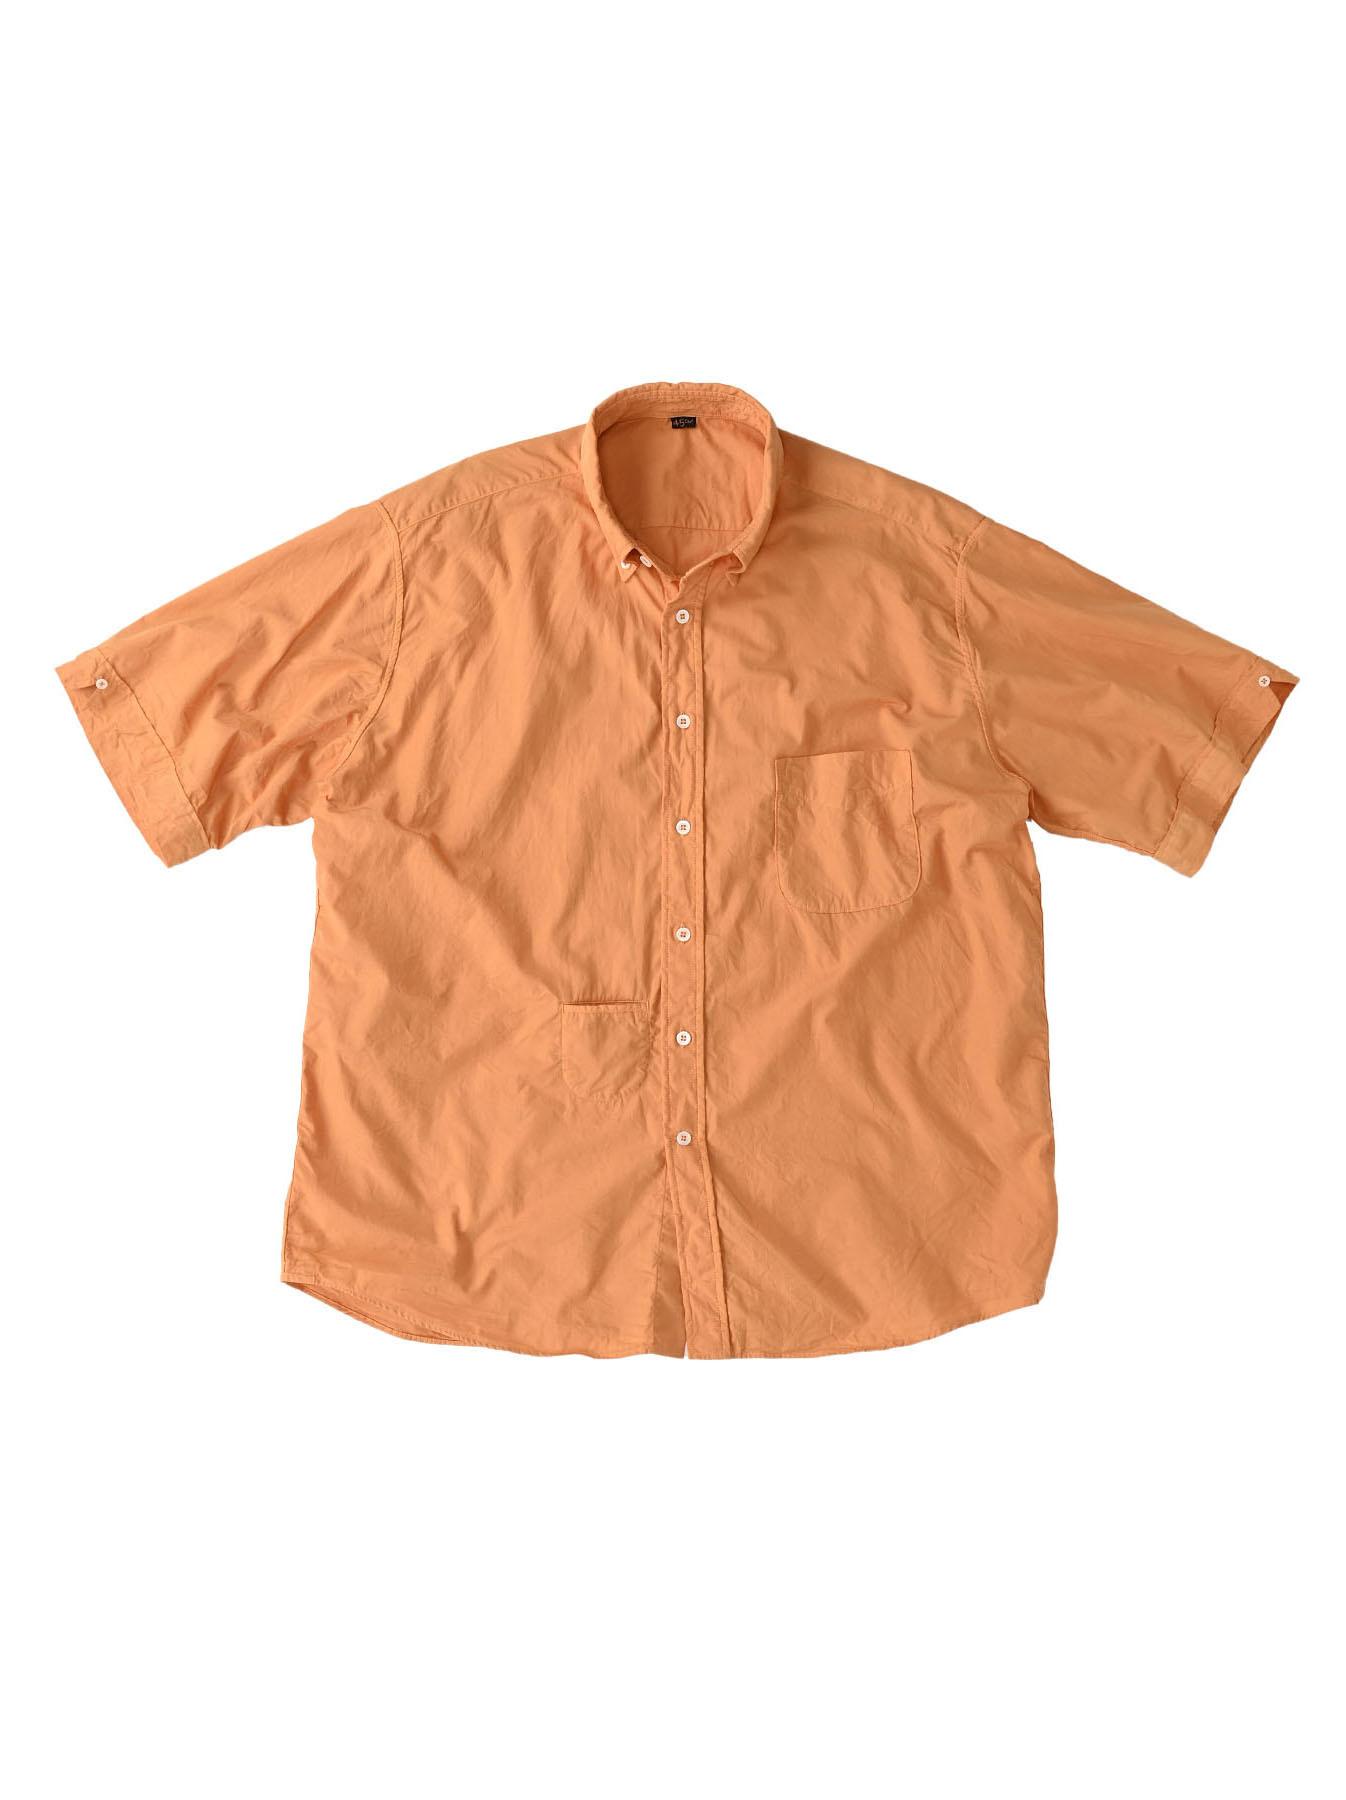 Damp Cotton Anuenue Ocean Shirt (0621)-2